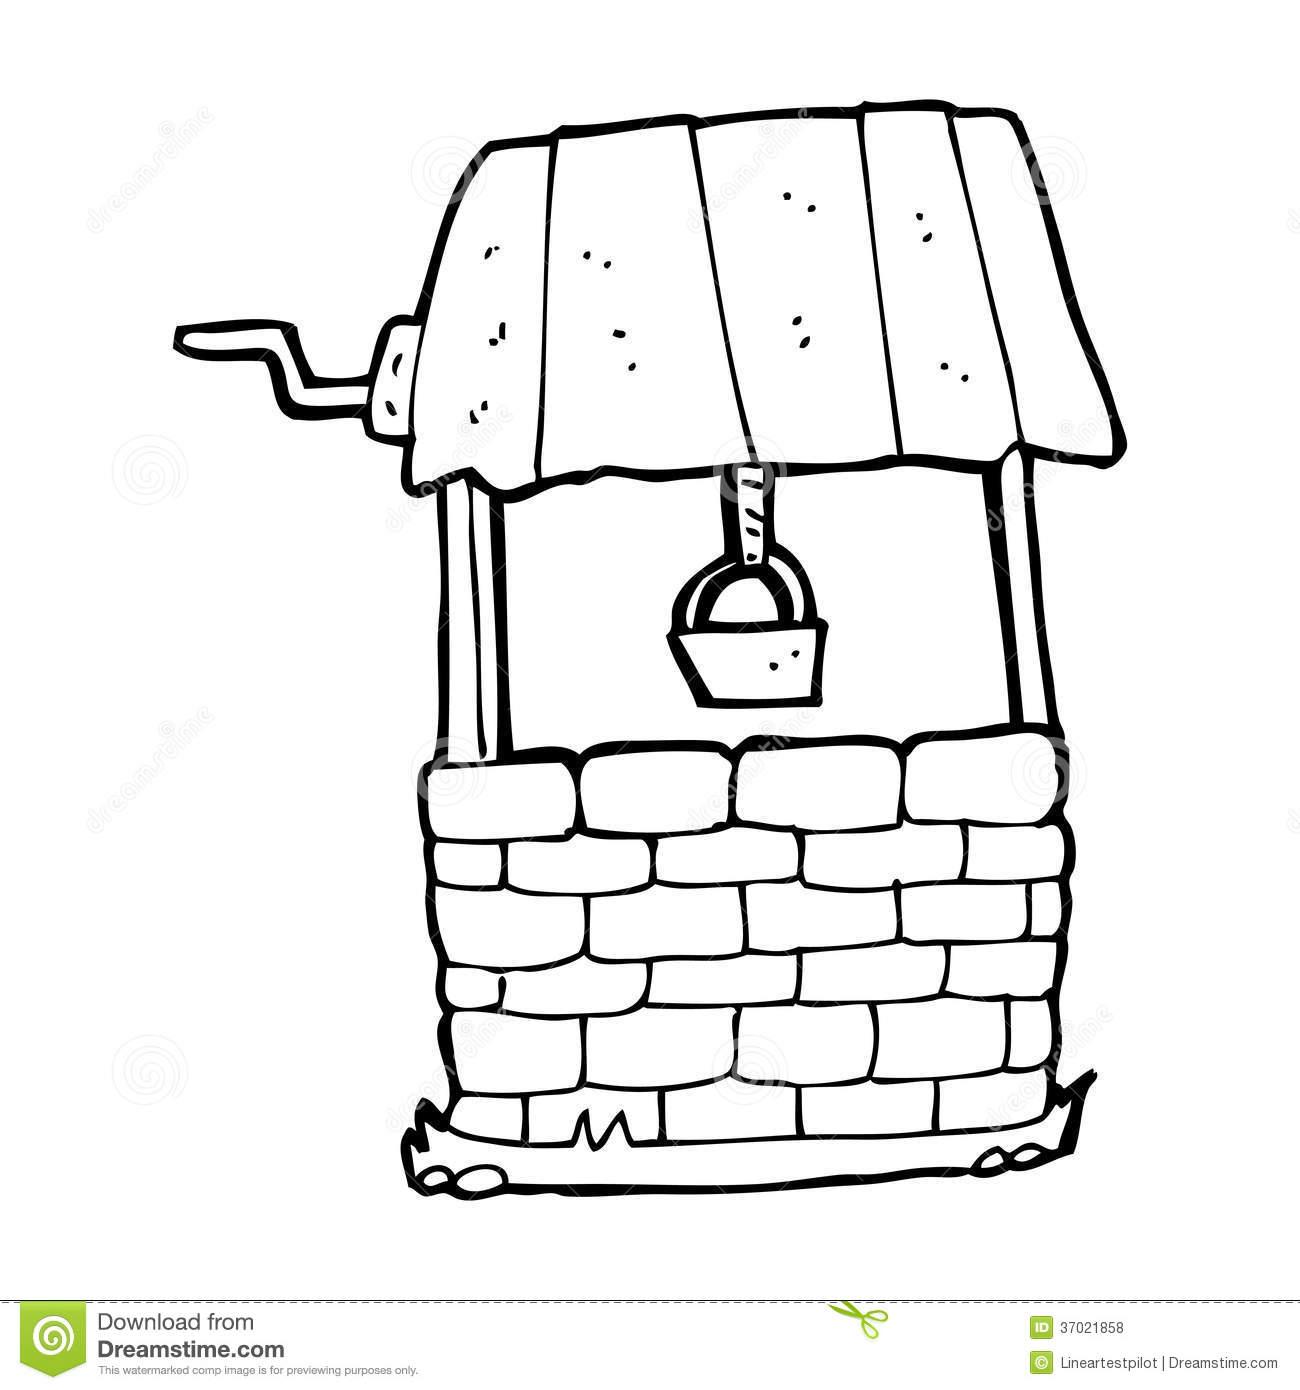 Cartoon wishing well stock illustration. Illustration of simple.